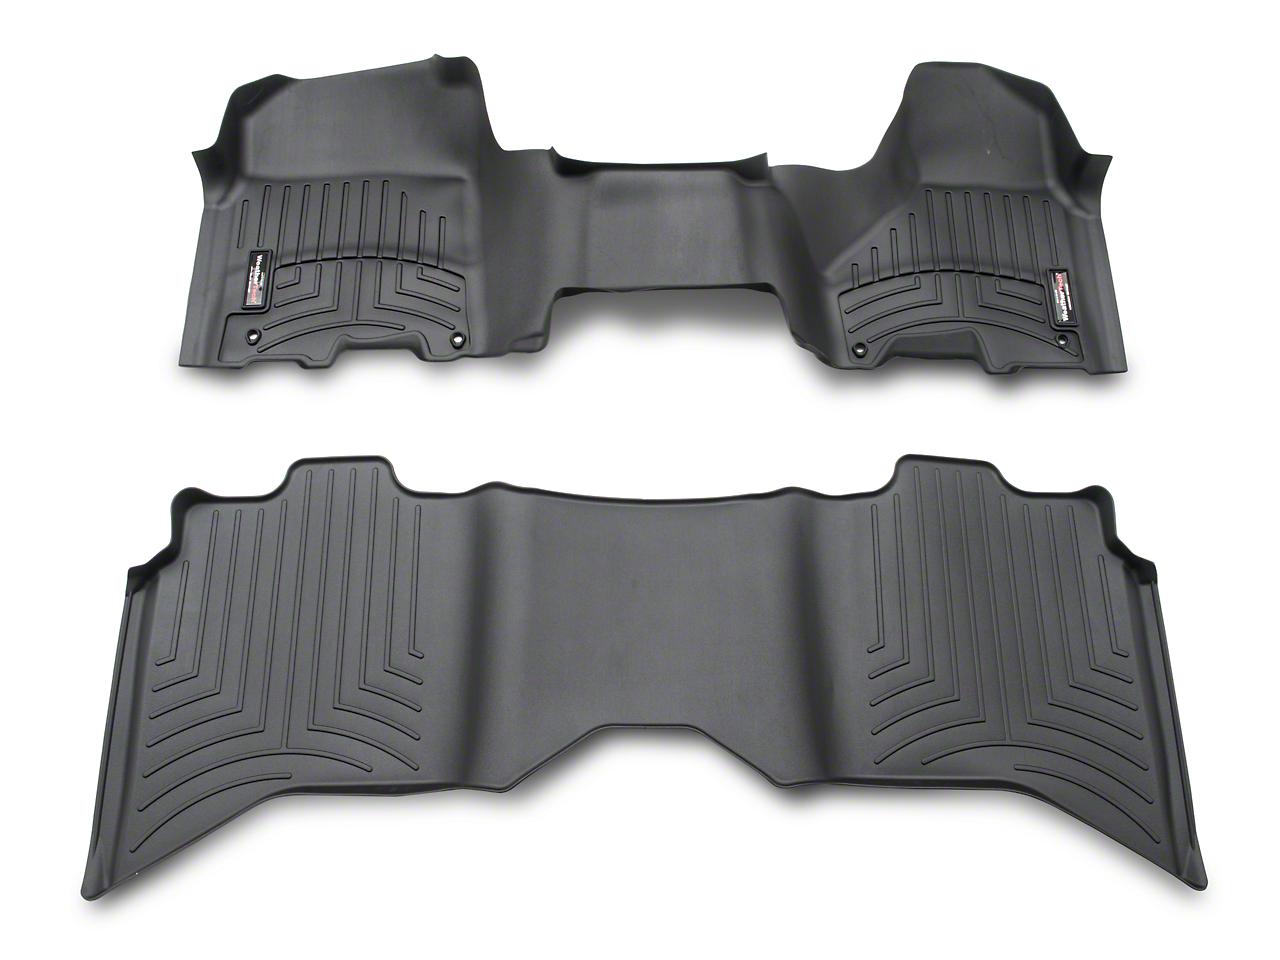 Weathertech DigitalFit Front & Rear Floor Liners - Over The Hump - Black (09-18 RAM 1500 Crew Cab; 12-18 Regular Cab, Quad Cab)